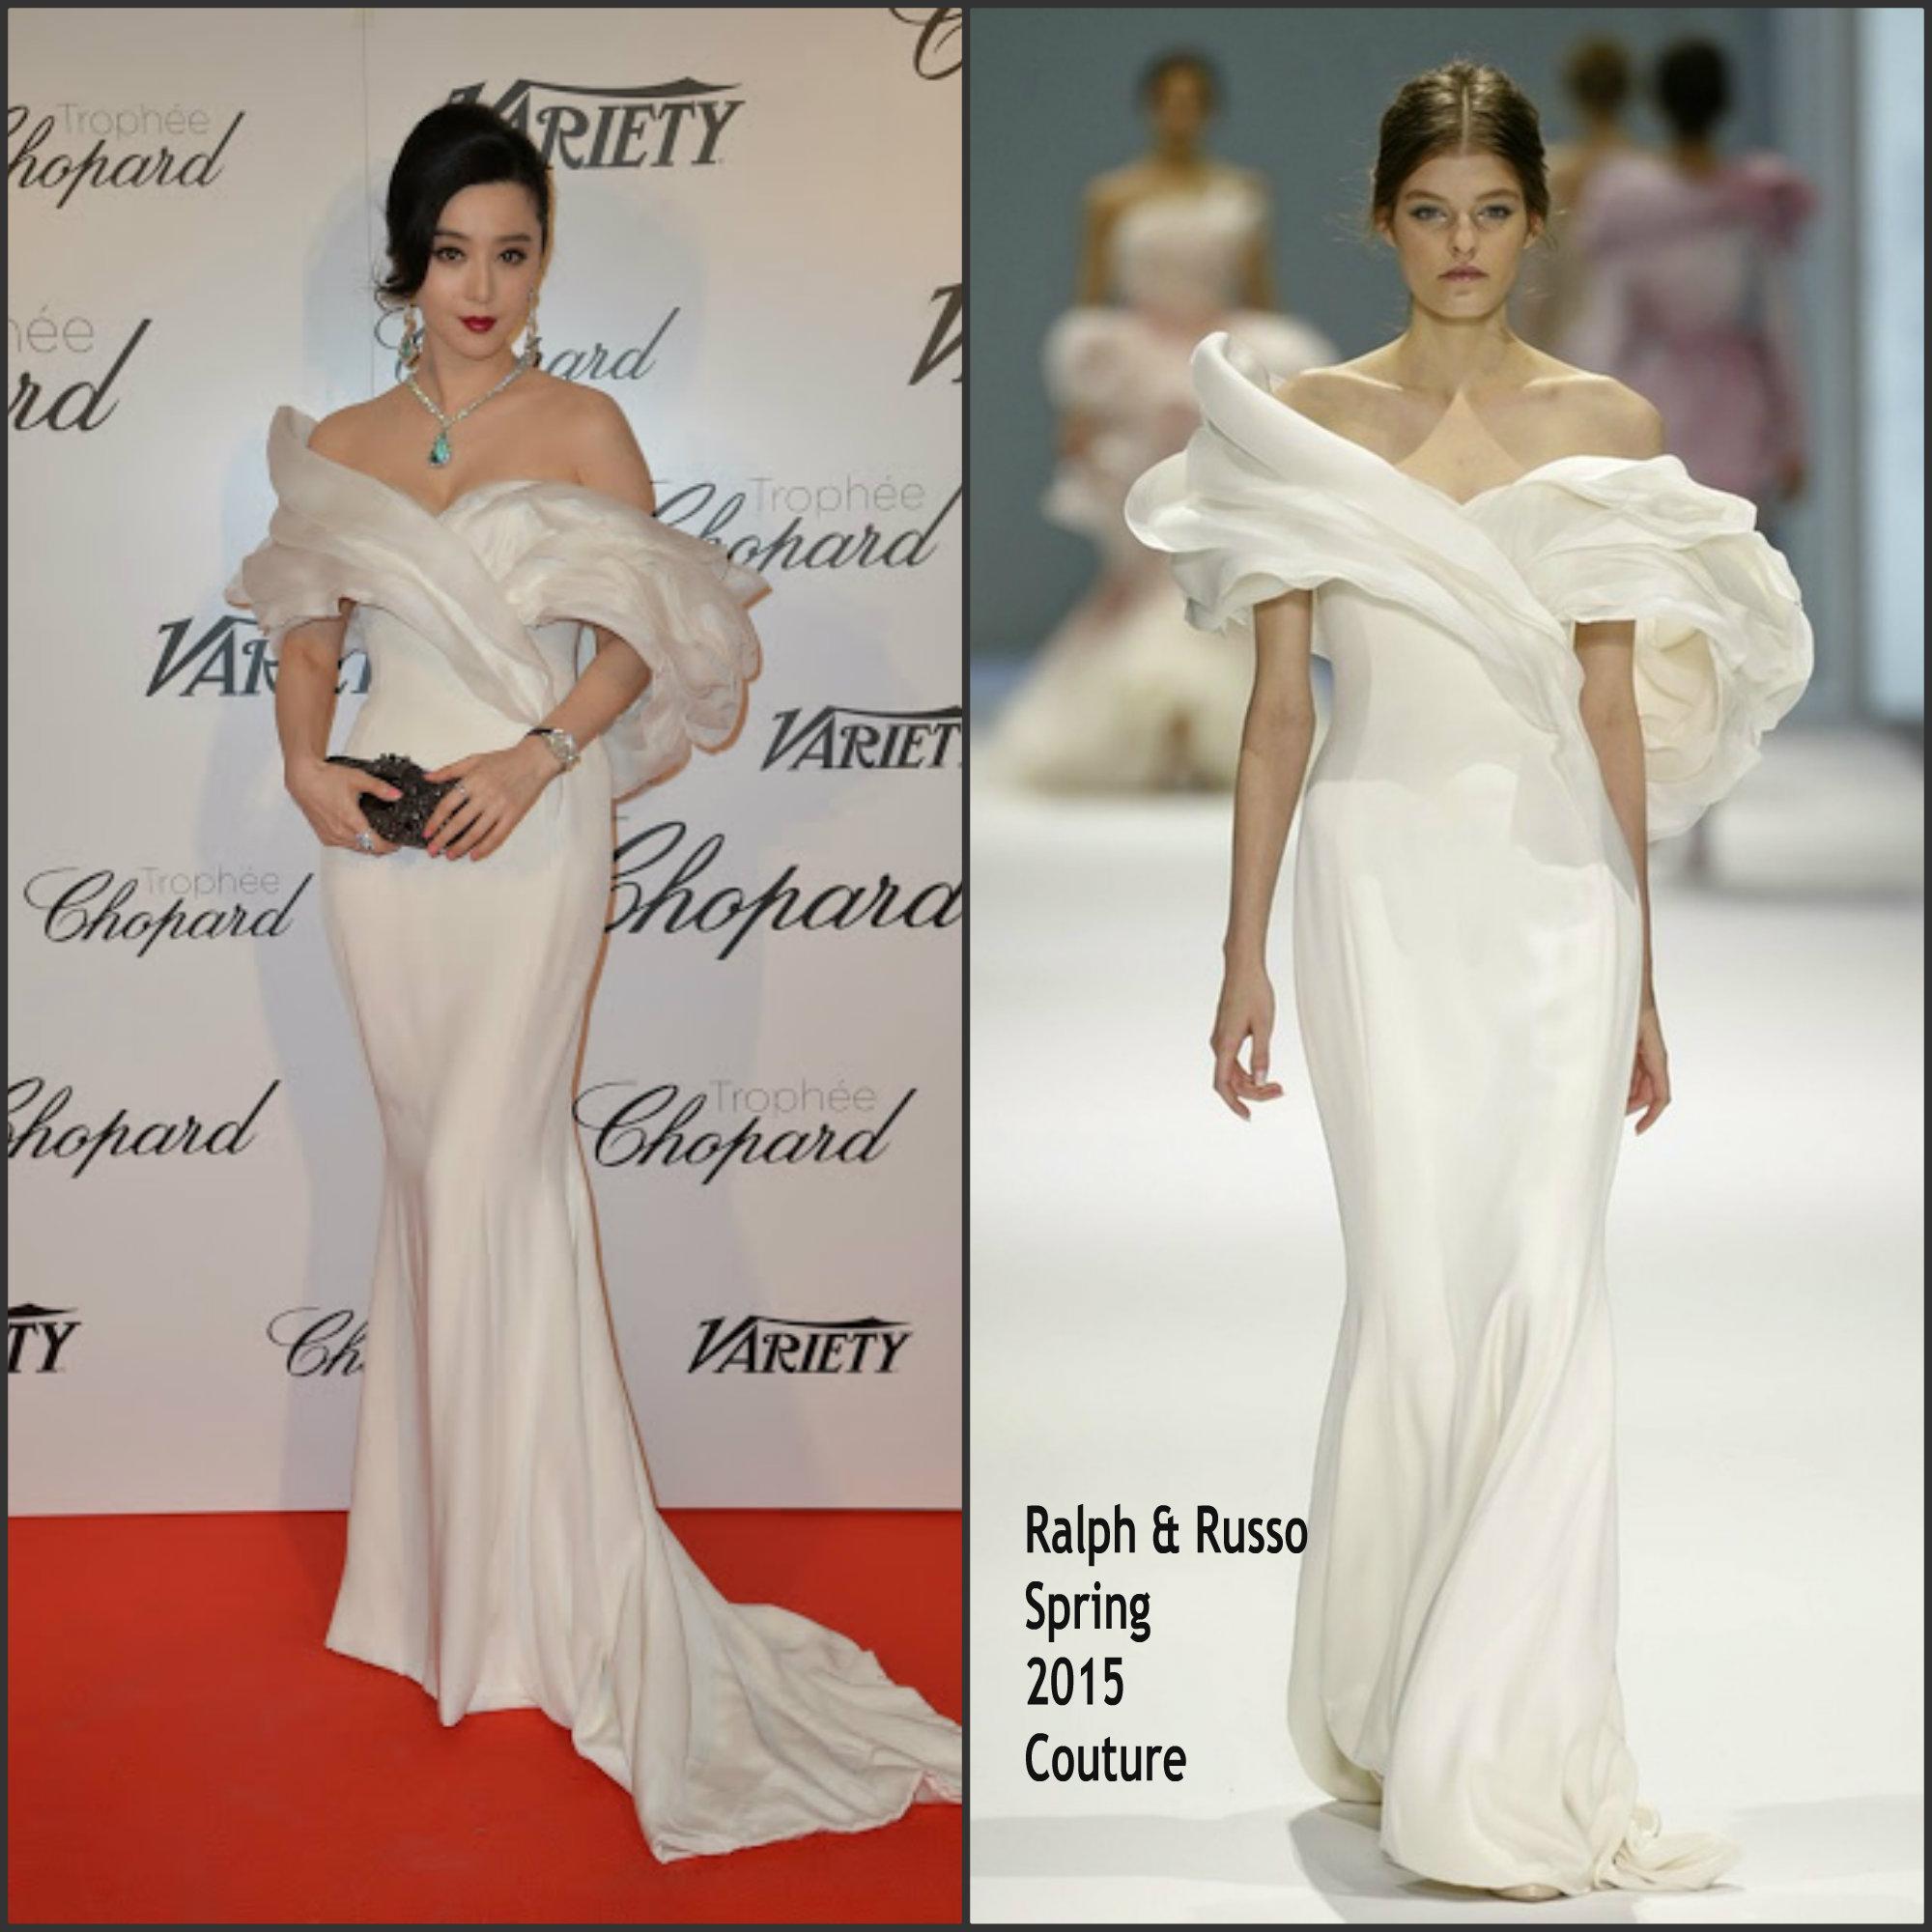 fan-bingbing-ralph-russo-couture-tophee-chopard